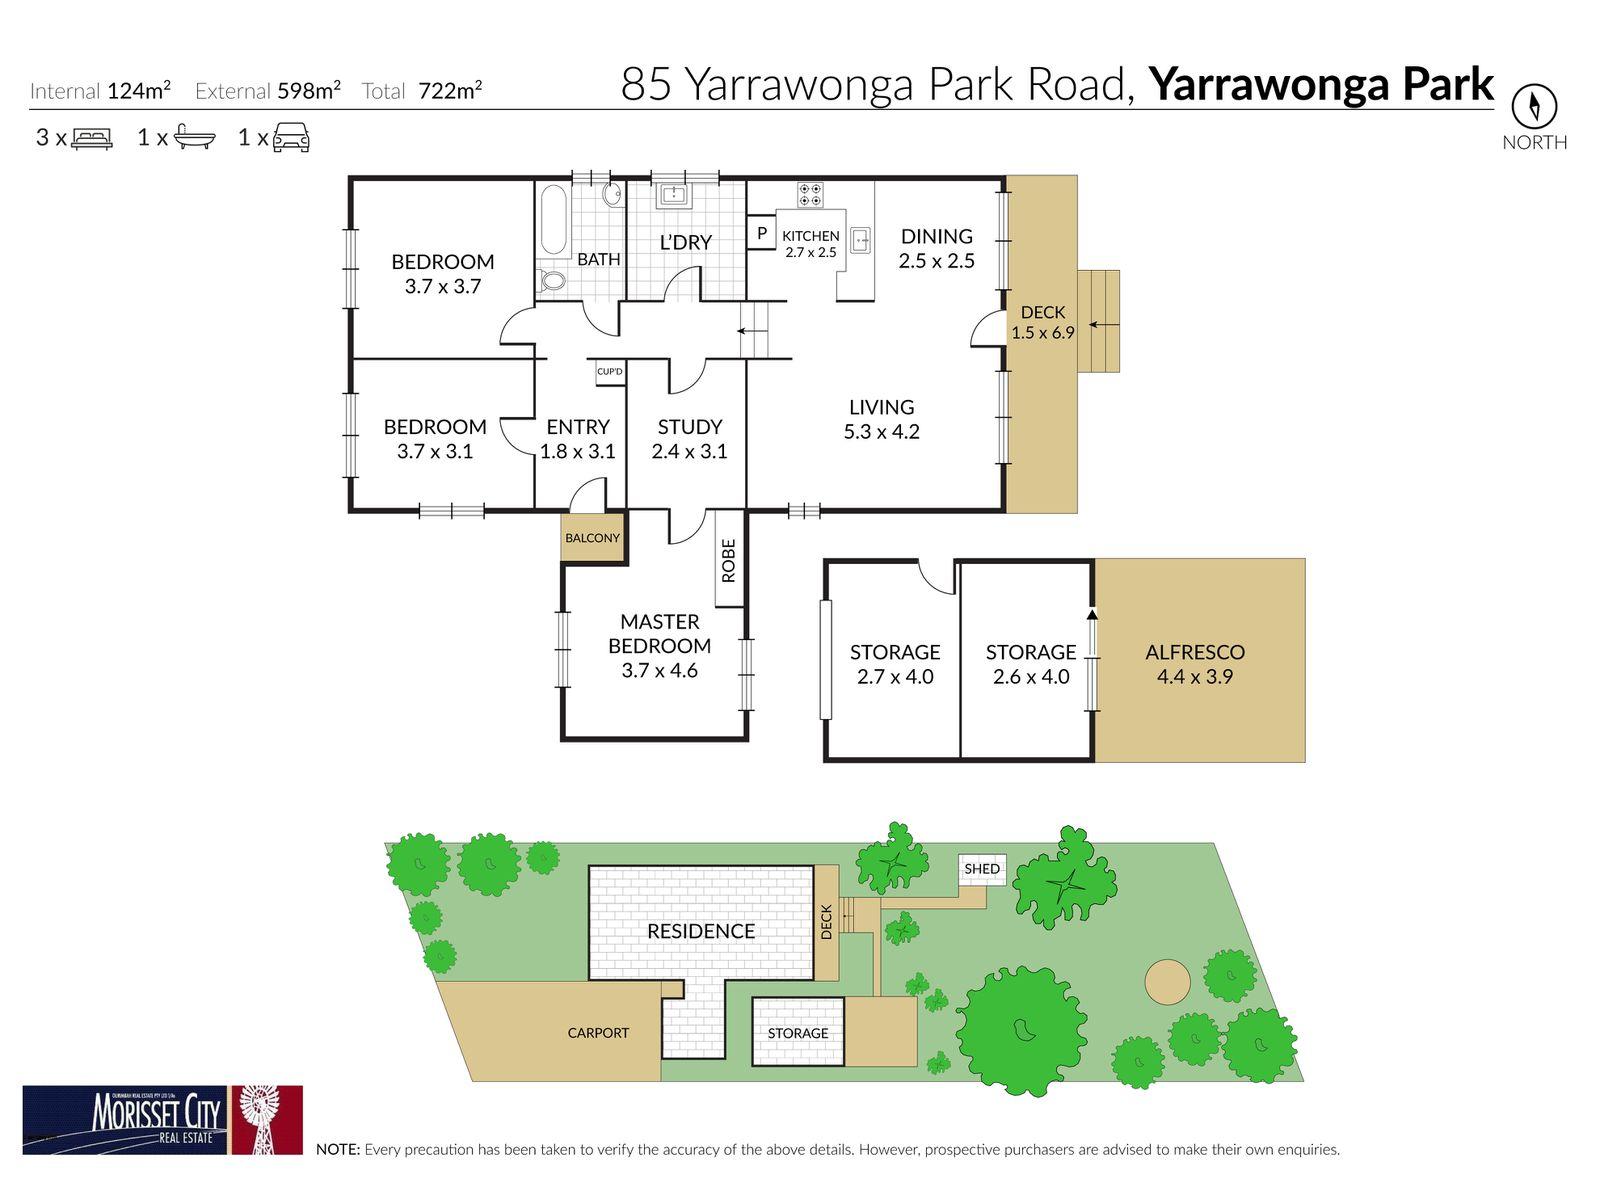 85 Yarrawonga Park Road, Yarrawonga Park